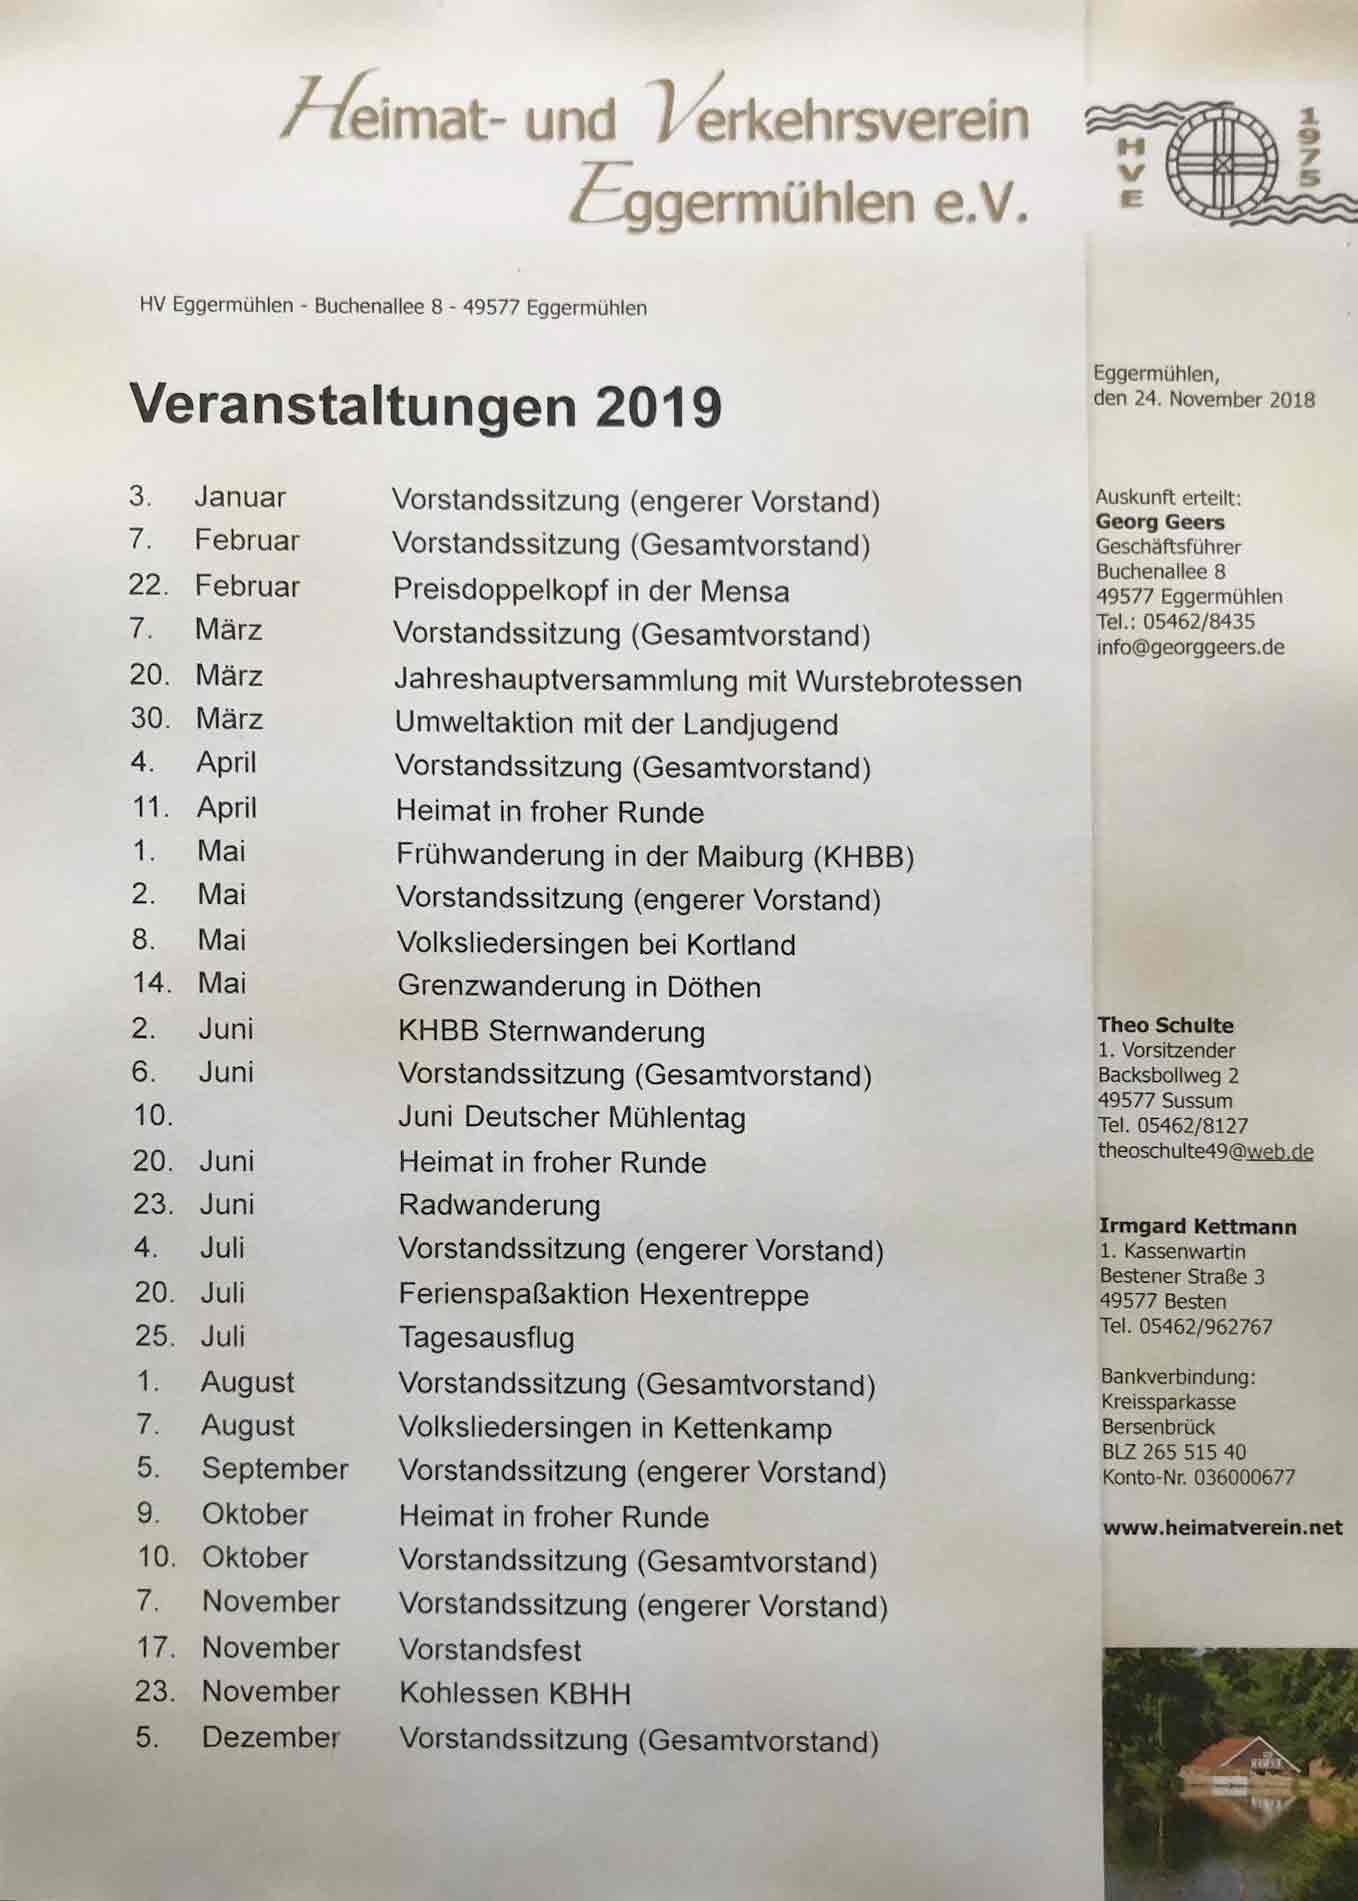 Veranstaktungen-2019.jpg